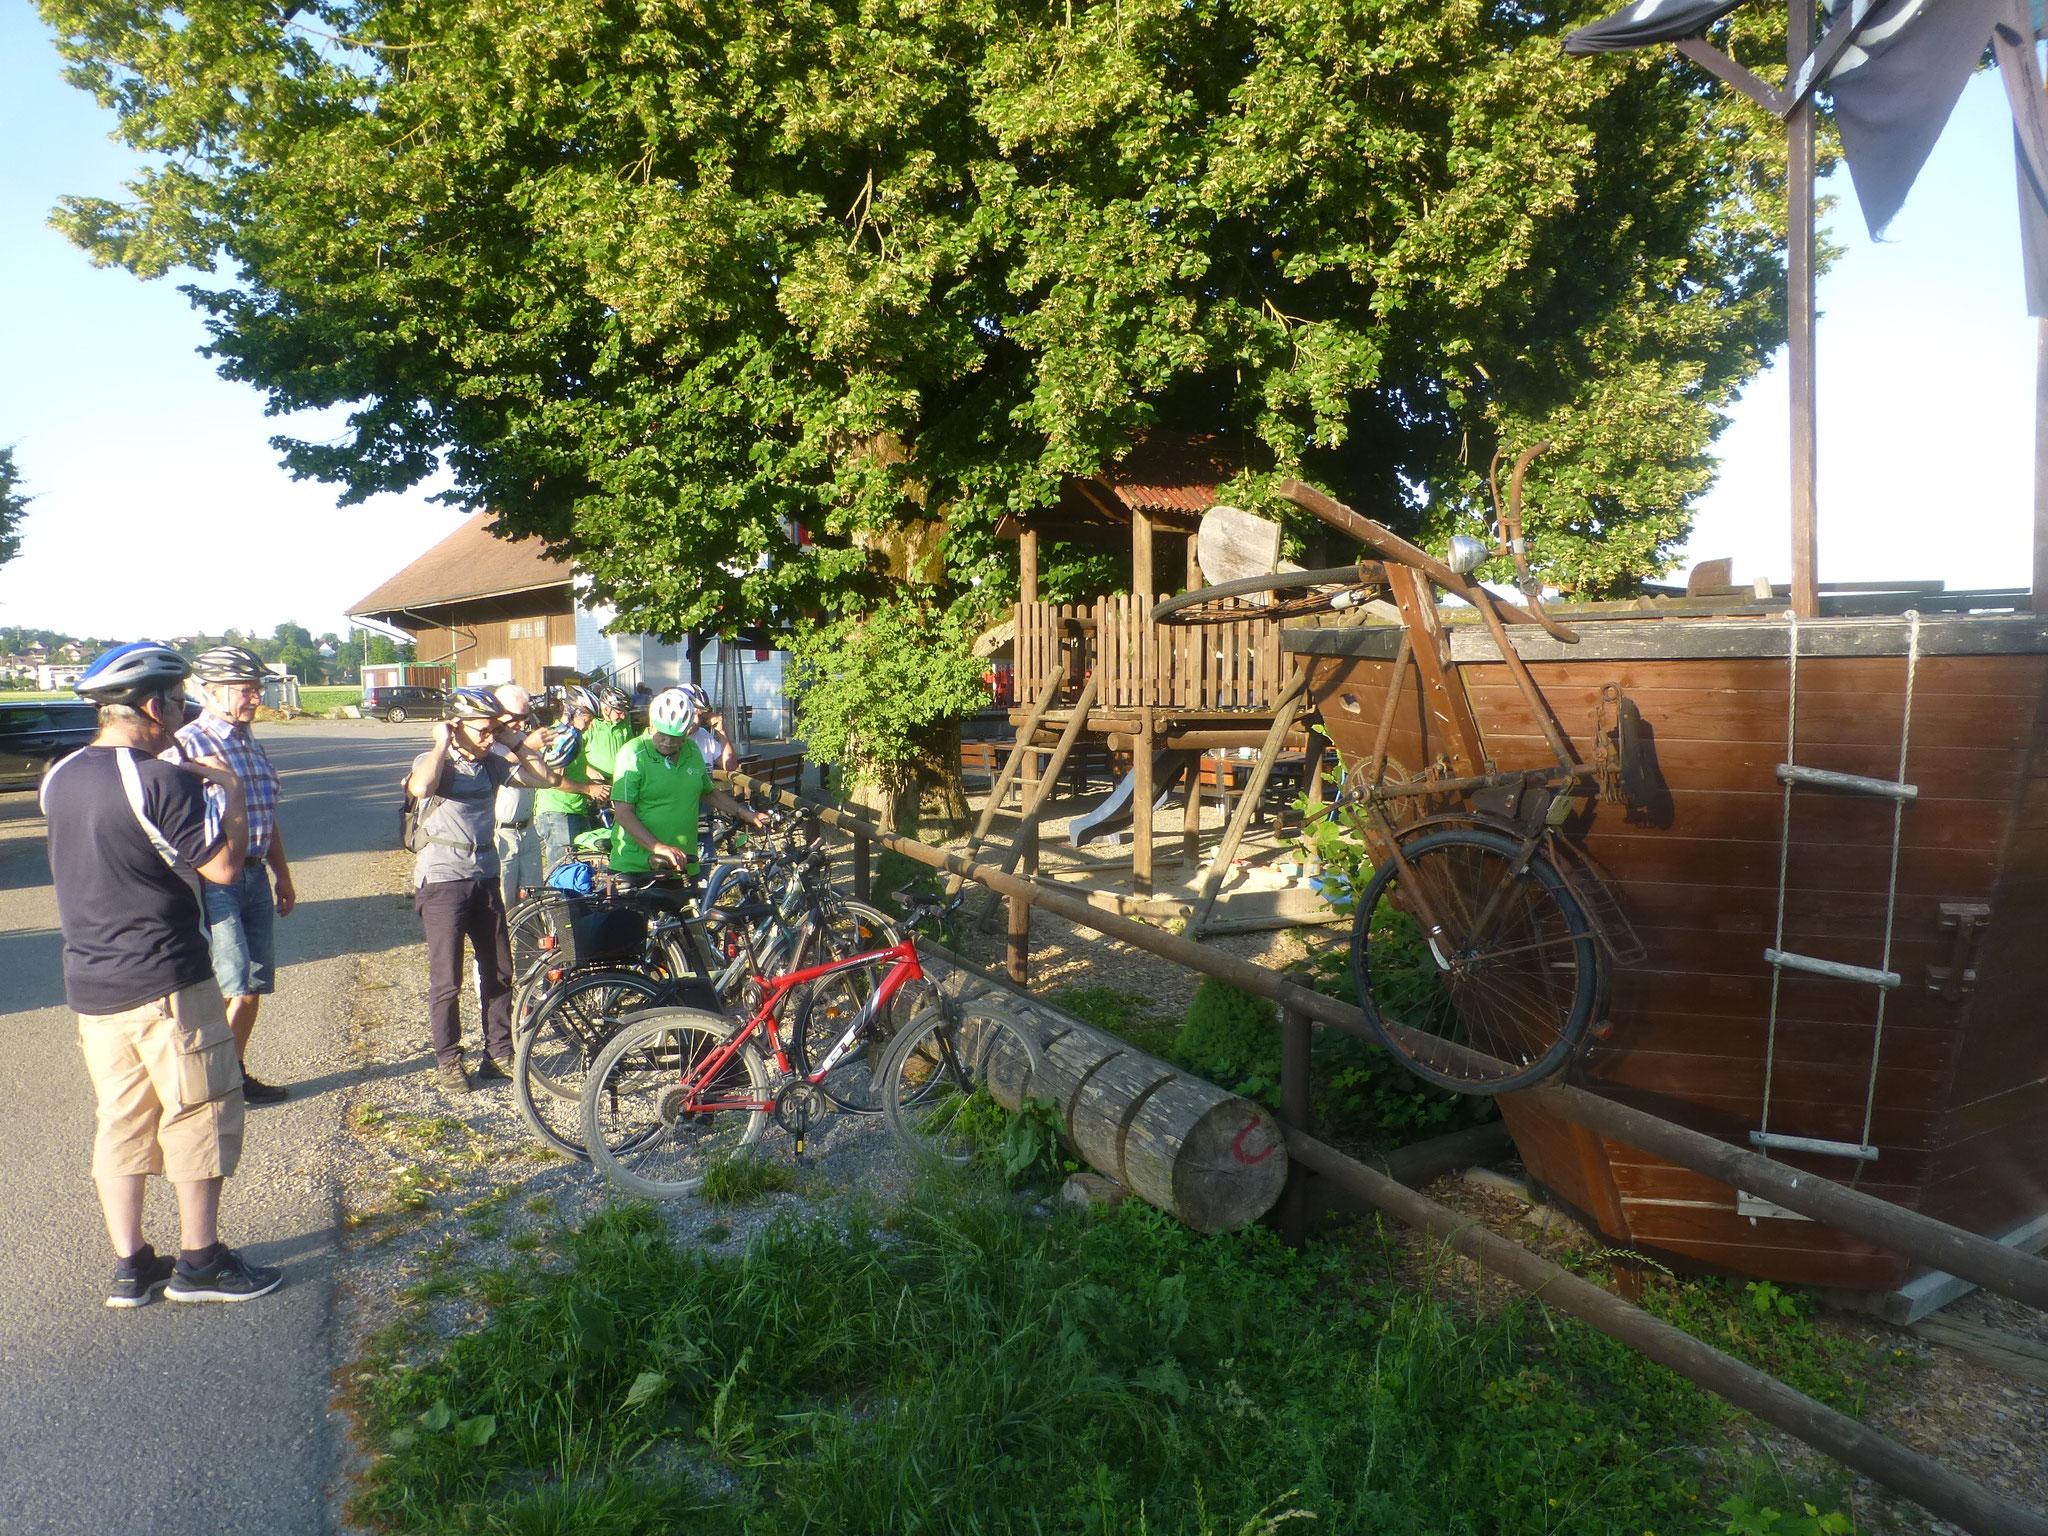 Ankunft in Au/Kradolf